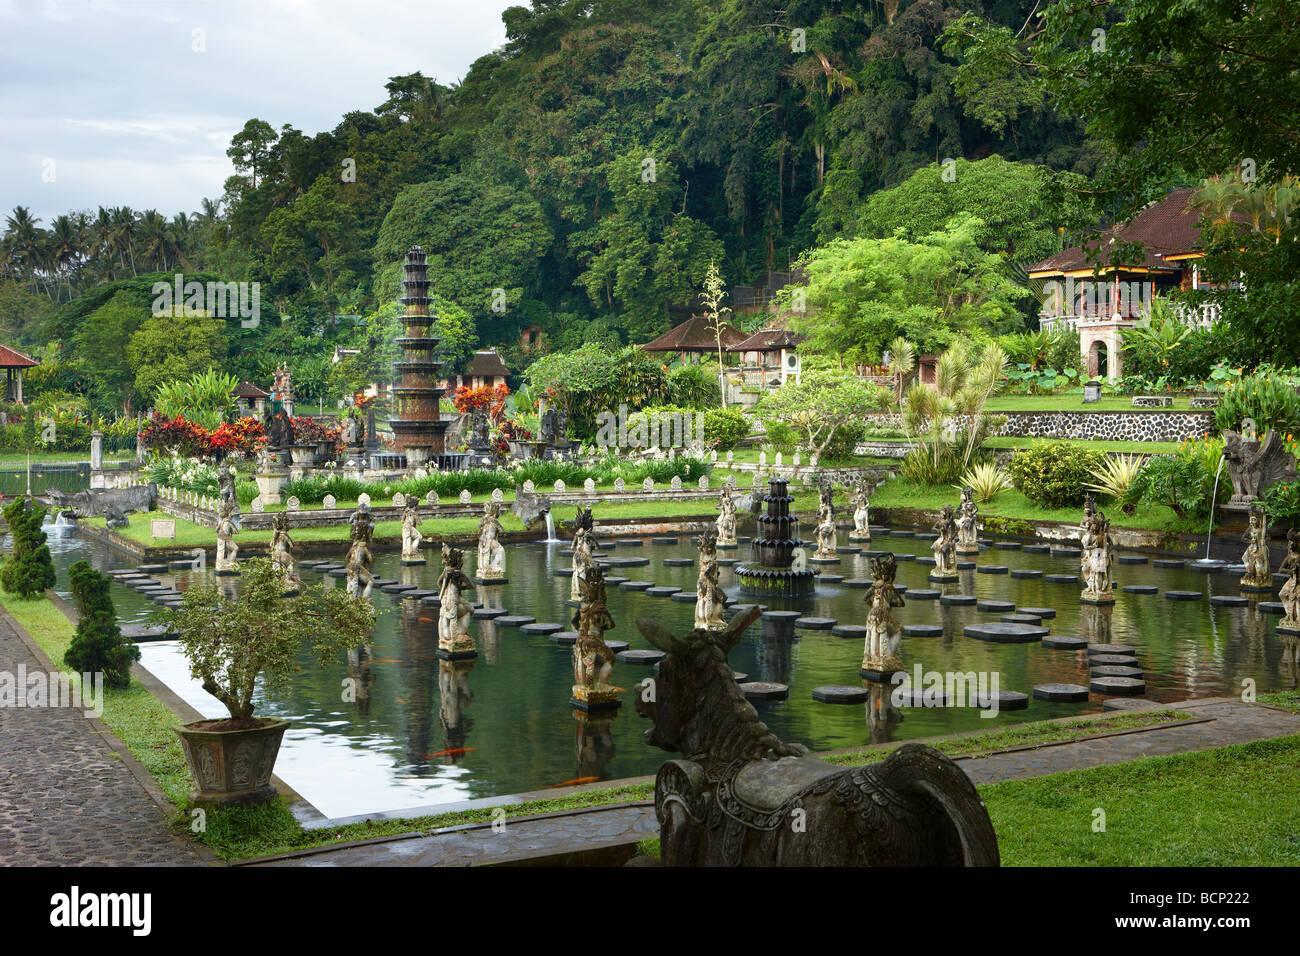 the water gardens at Tirtagangga, Bali, Indonesia - Stock Image